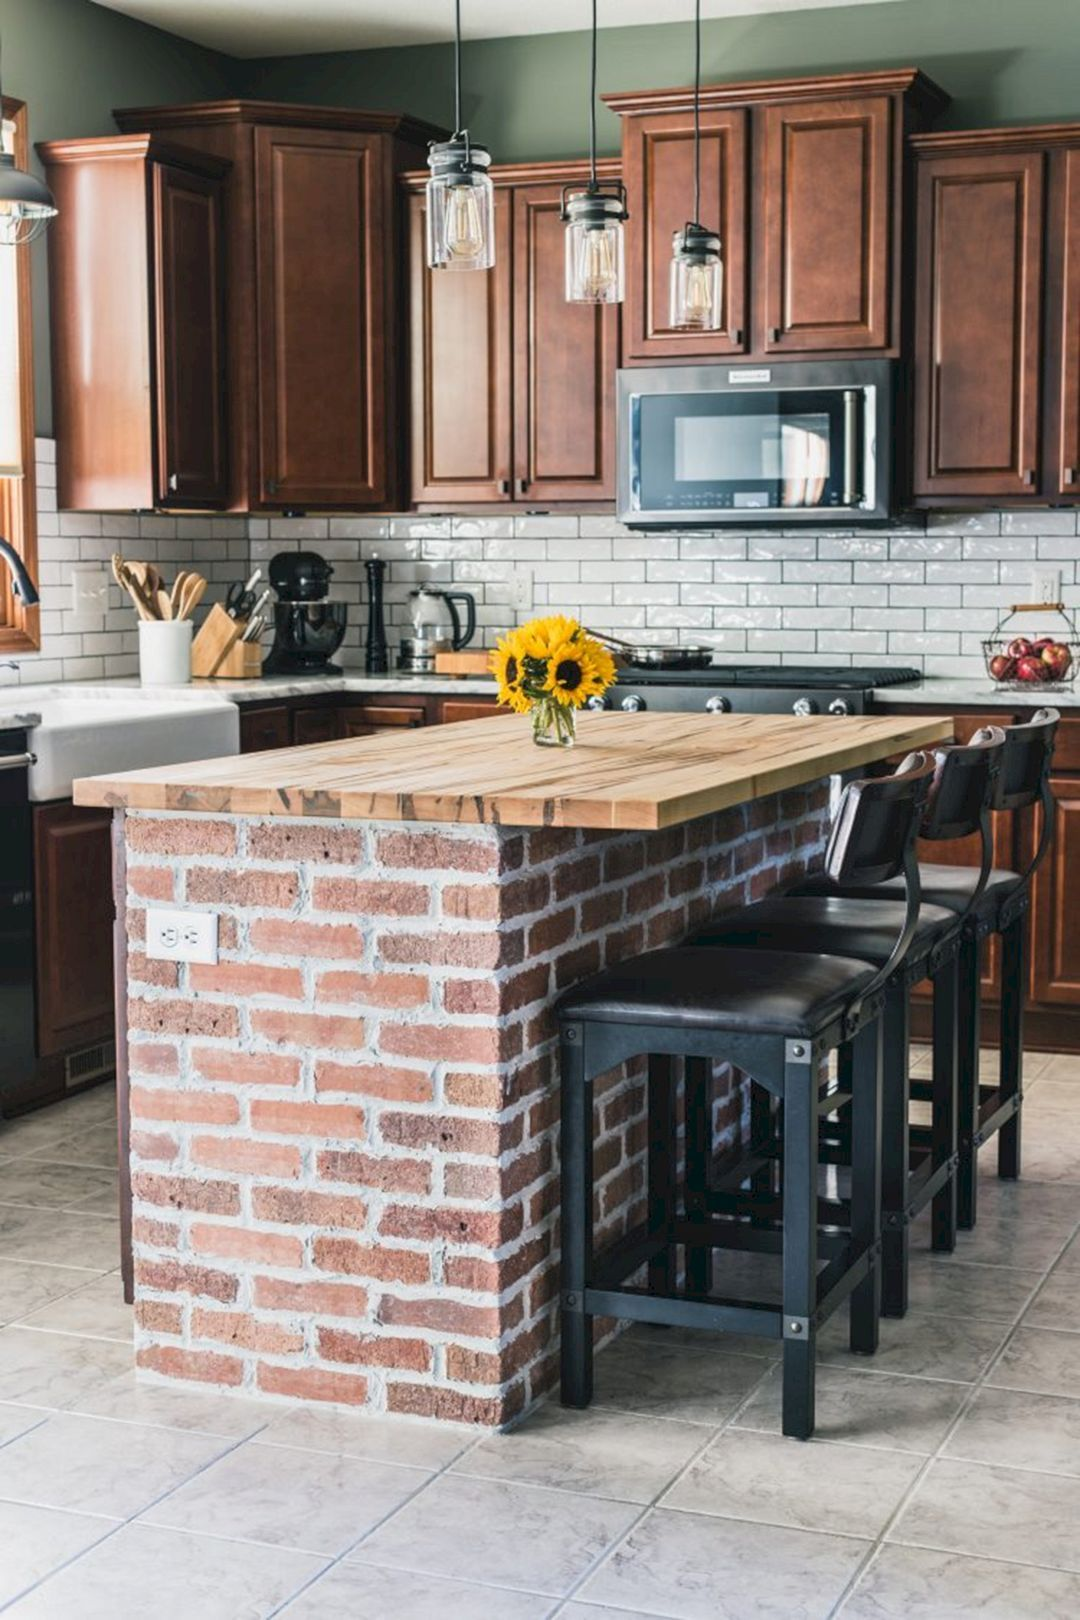 24 Gorgeous Brick Wall Kitchen For Unique Kitchen Ideas Brick